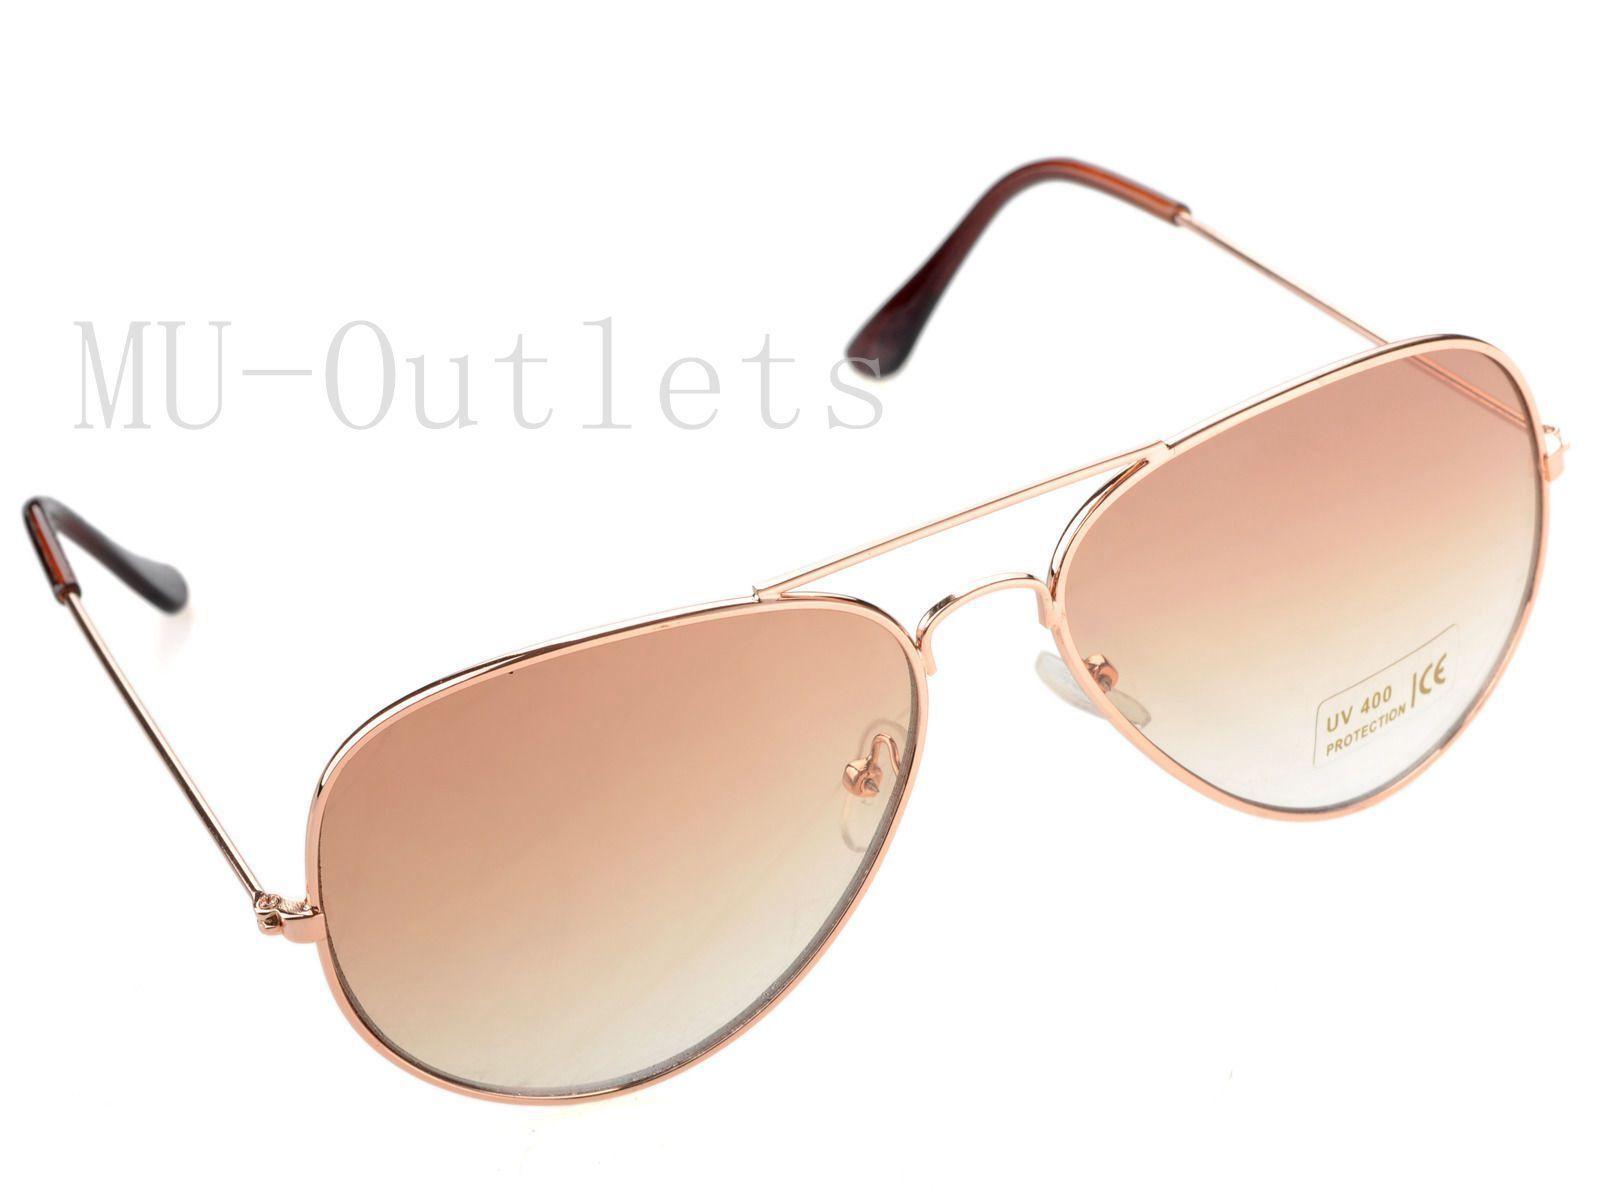 New Classic Aviator Fashion Sunglasses For Men's Women's Ret